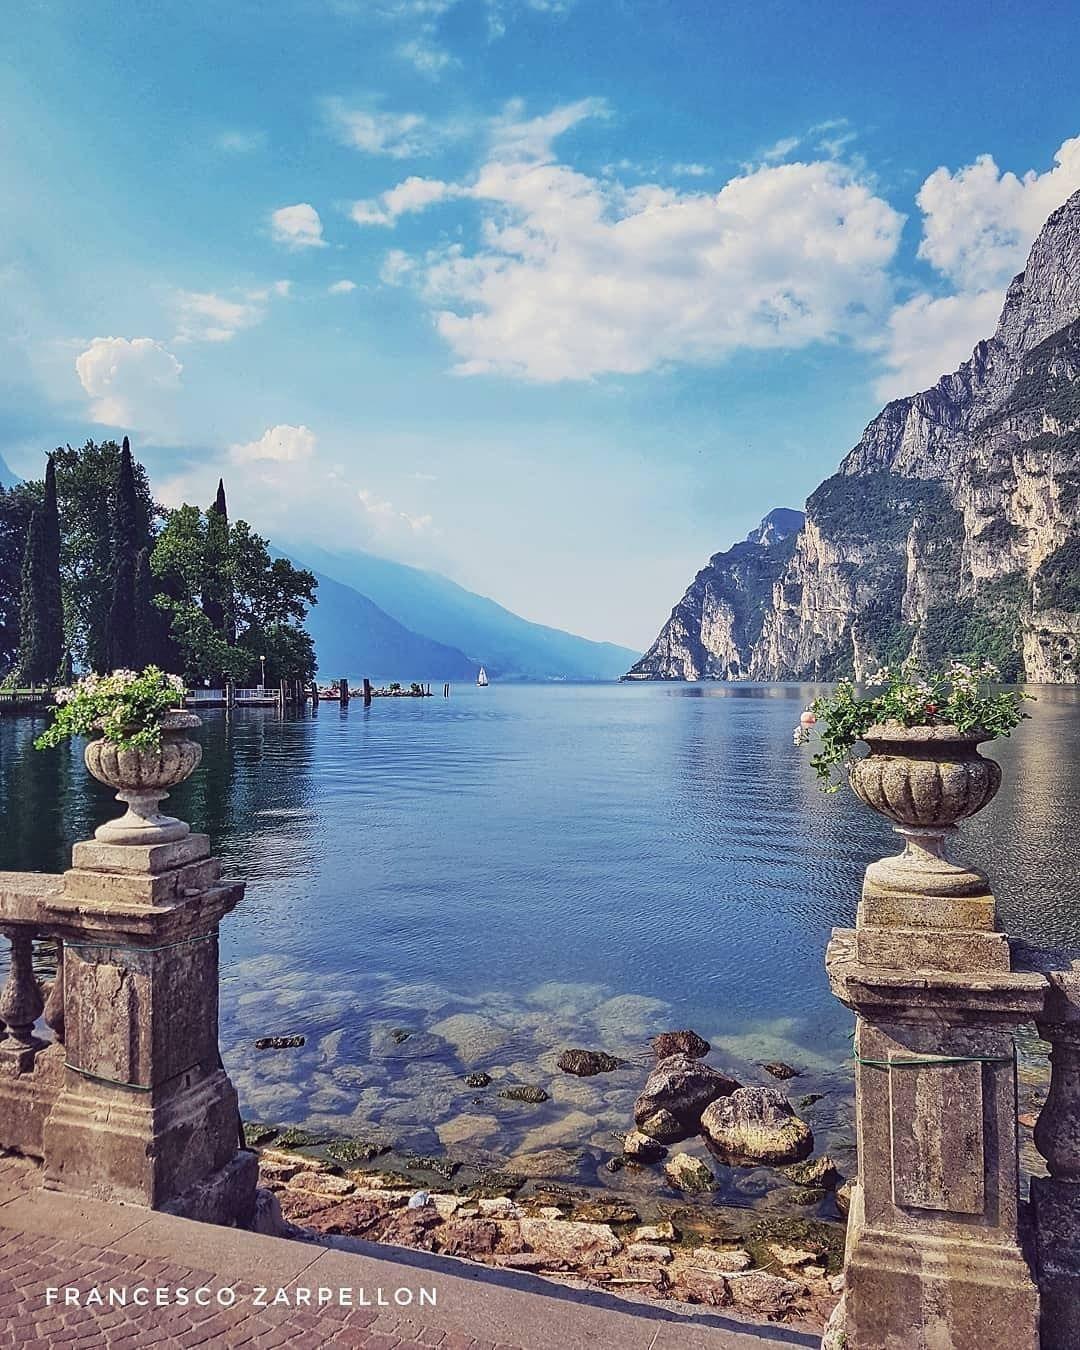 What A Place Riva Del Garda Garda Lake Italy Photo By Francesco Zarpellon Places To Travel Italian Lakes Italy Travel